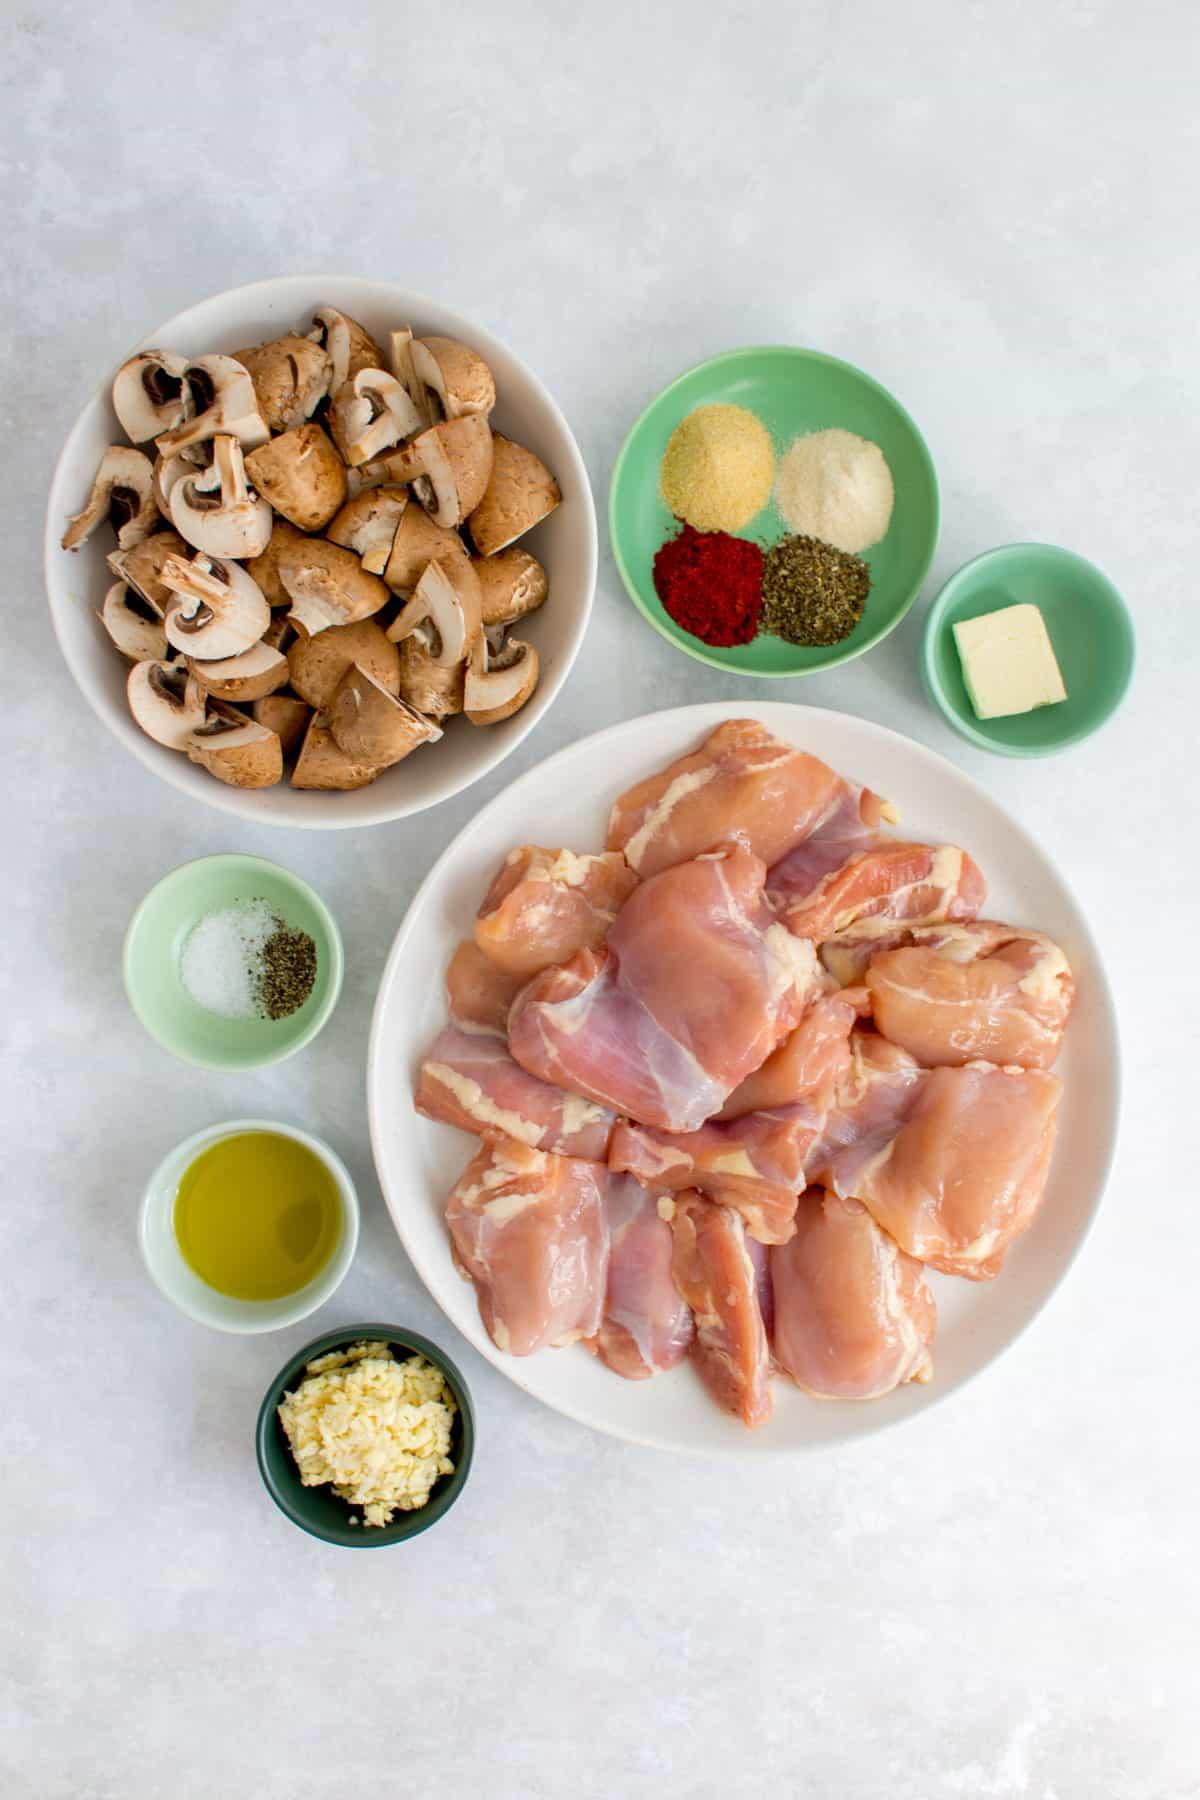 Ingredients needed to make chicken thighs with garlic mushrooms.